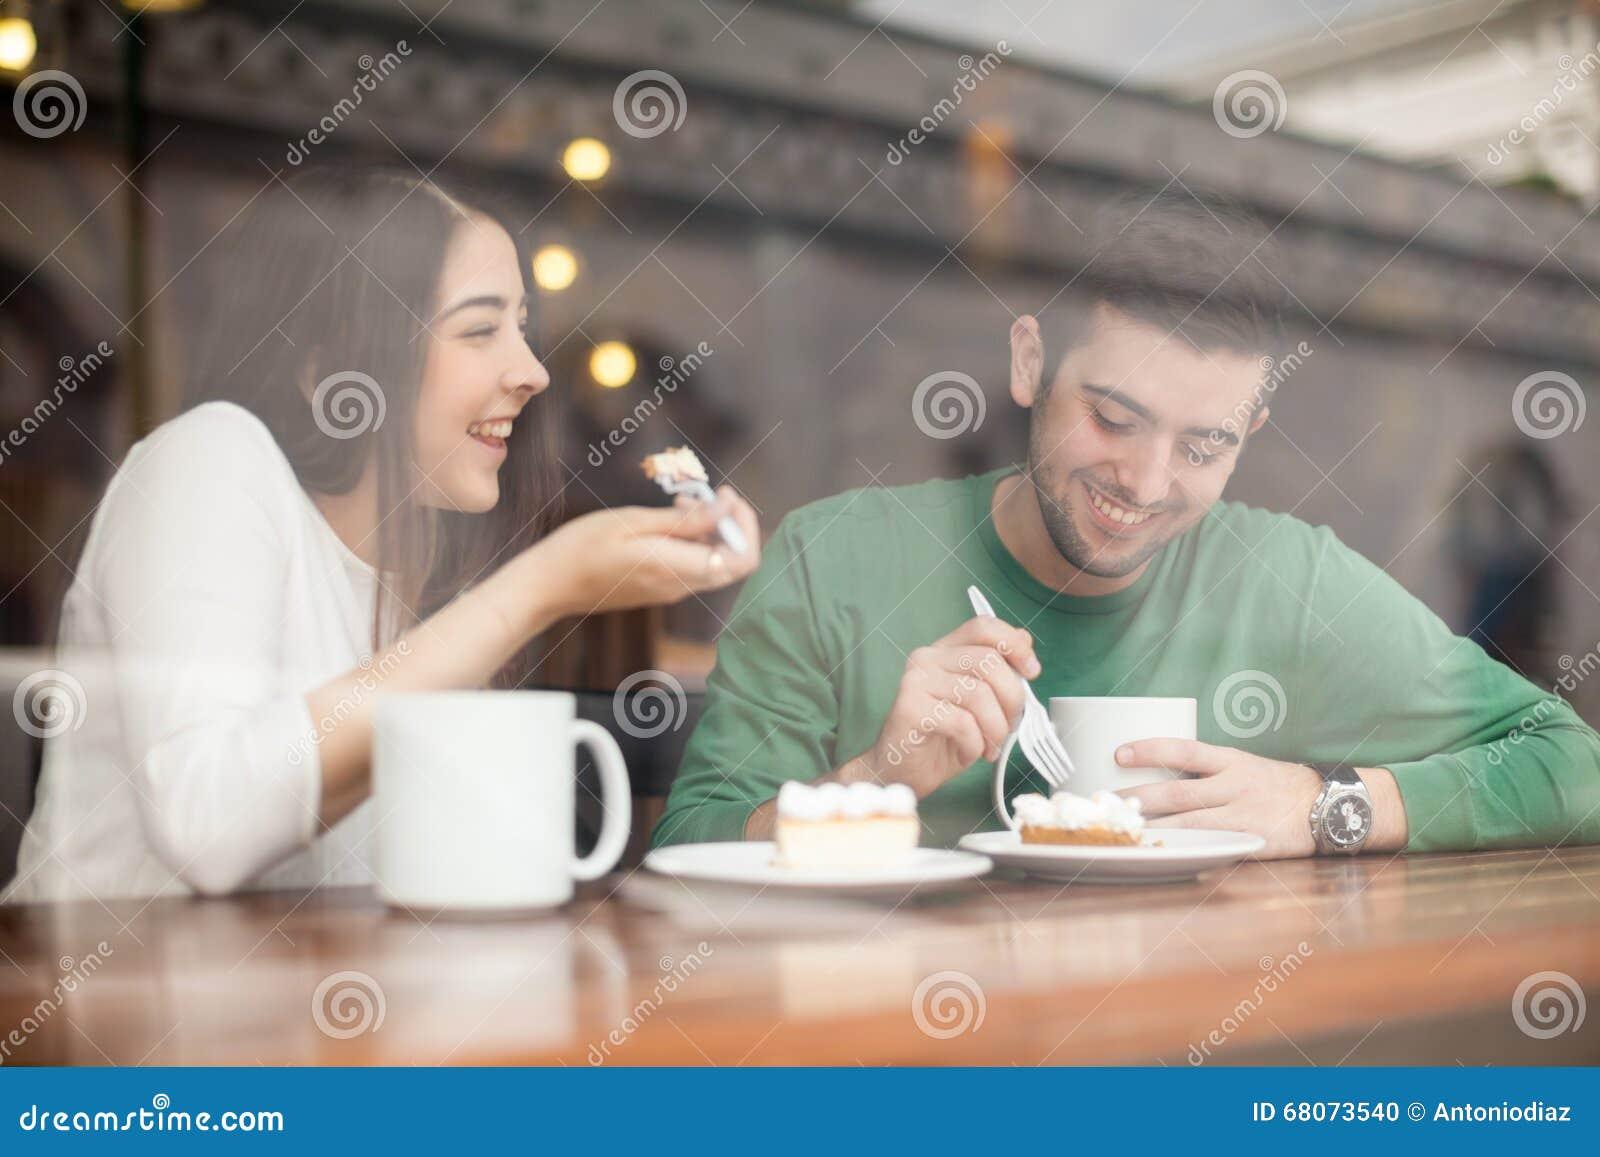 Speed dating 11561